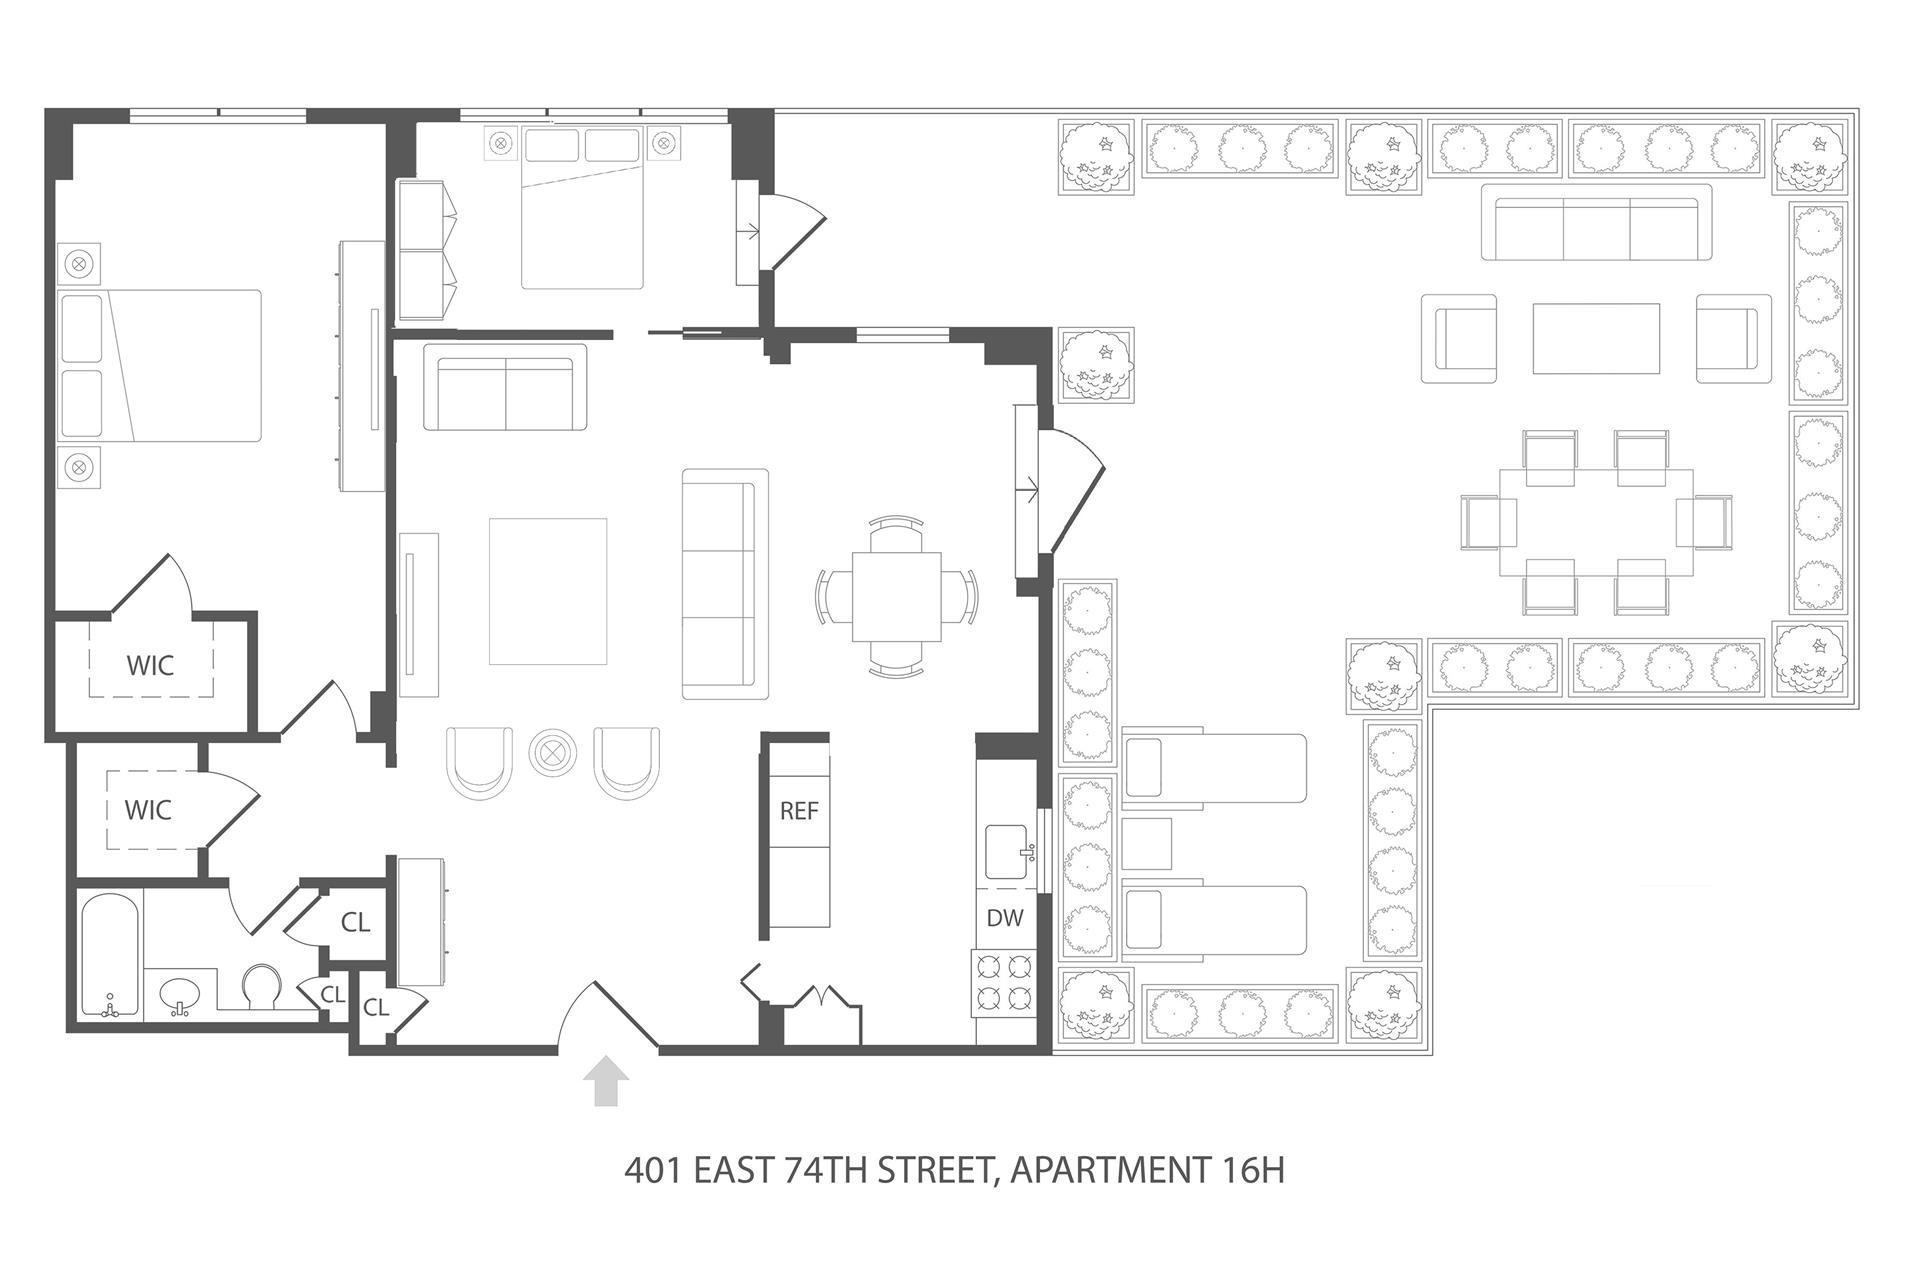 Floor plan of 401 East 74th Street, 16H - Upper East Side, New York